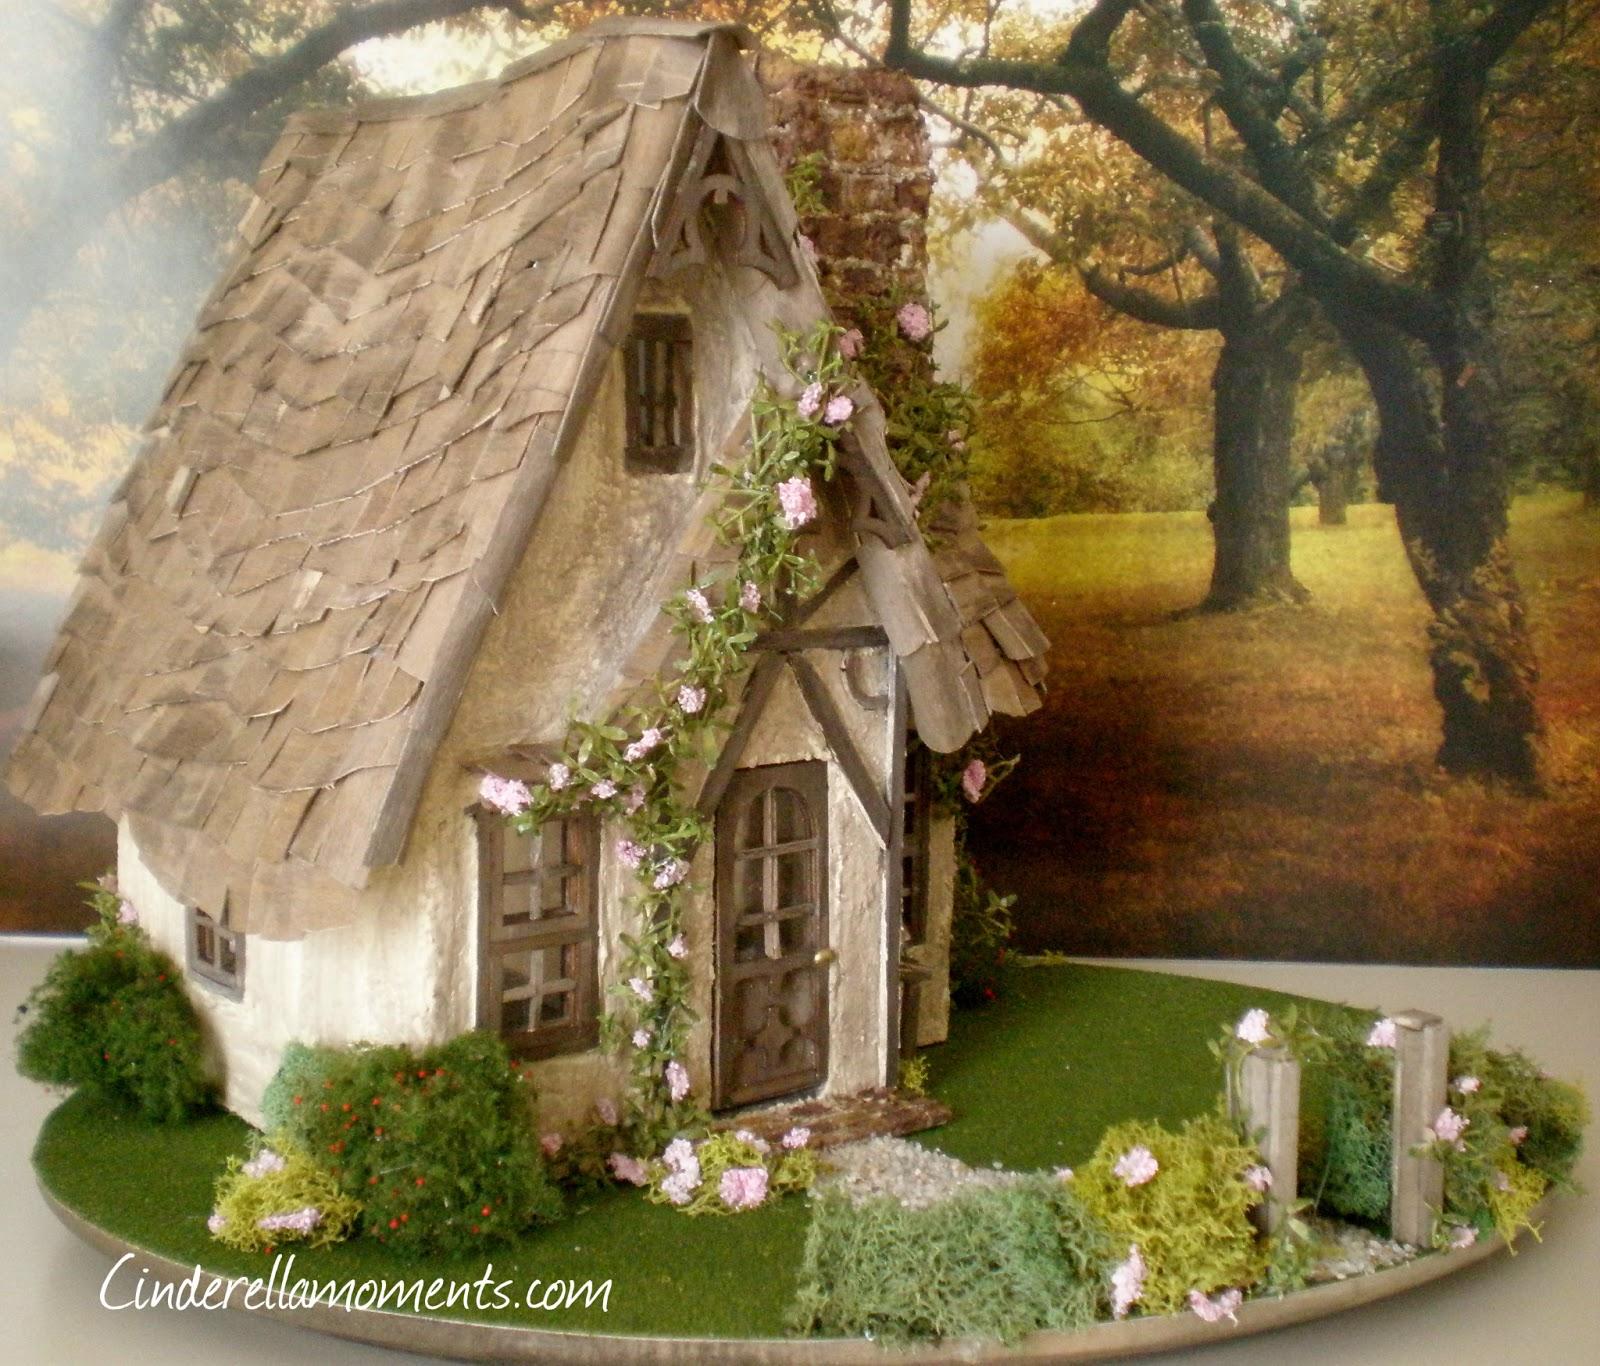 English Cottage Village: Cinderella Moments: Miss Read's English Cottage